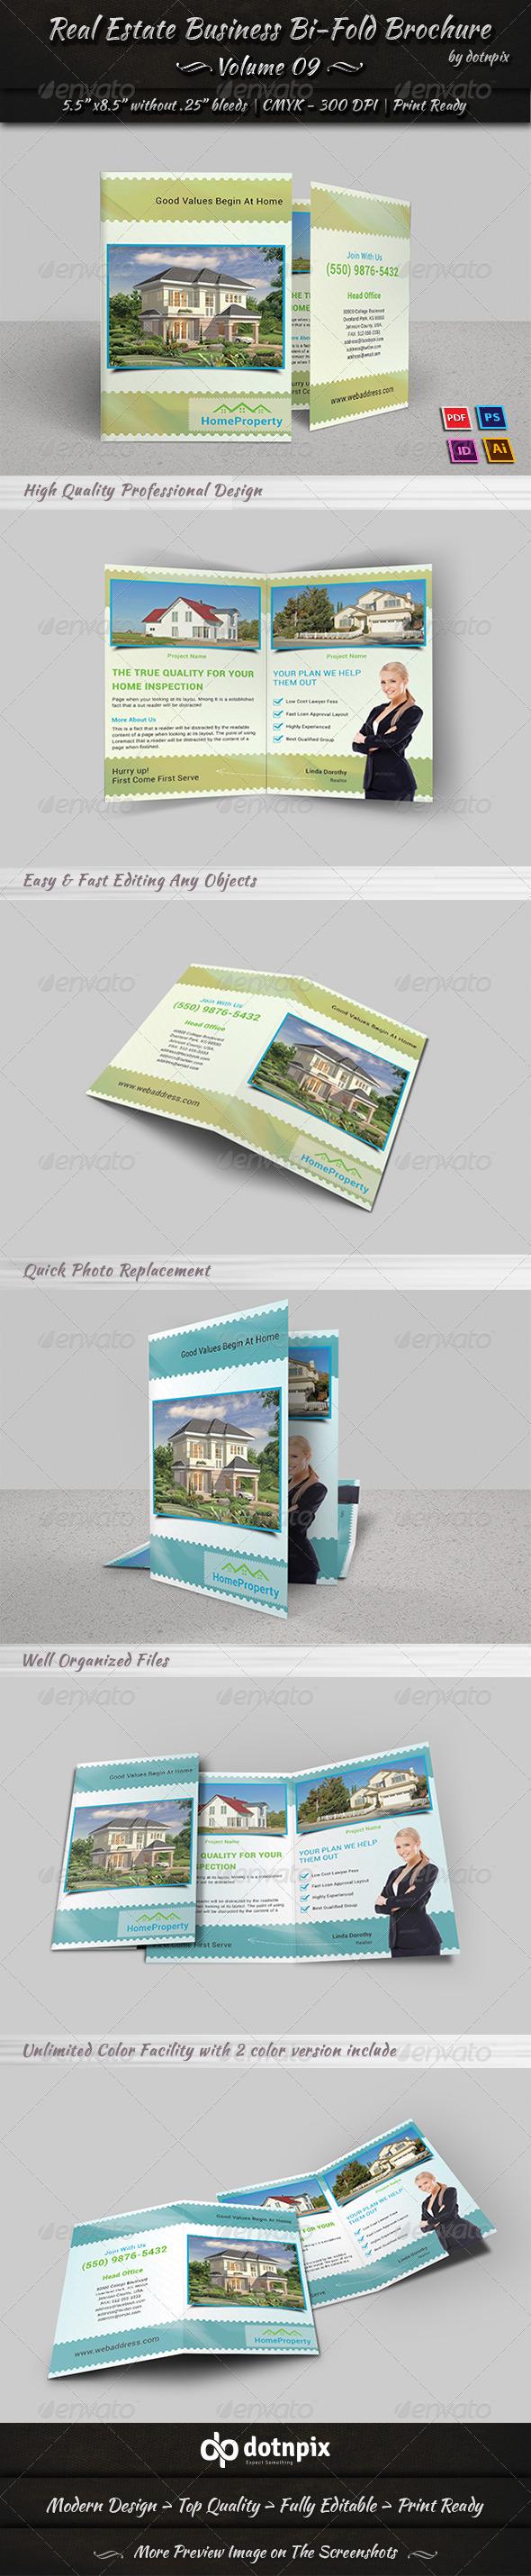 GraphicRiver Real Estate Business Bi-Fold Brochure Volume 9 7397361